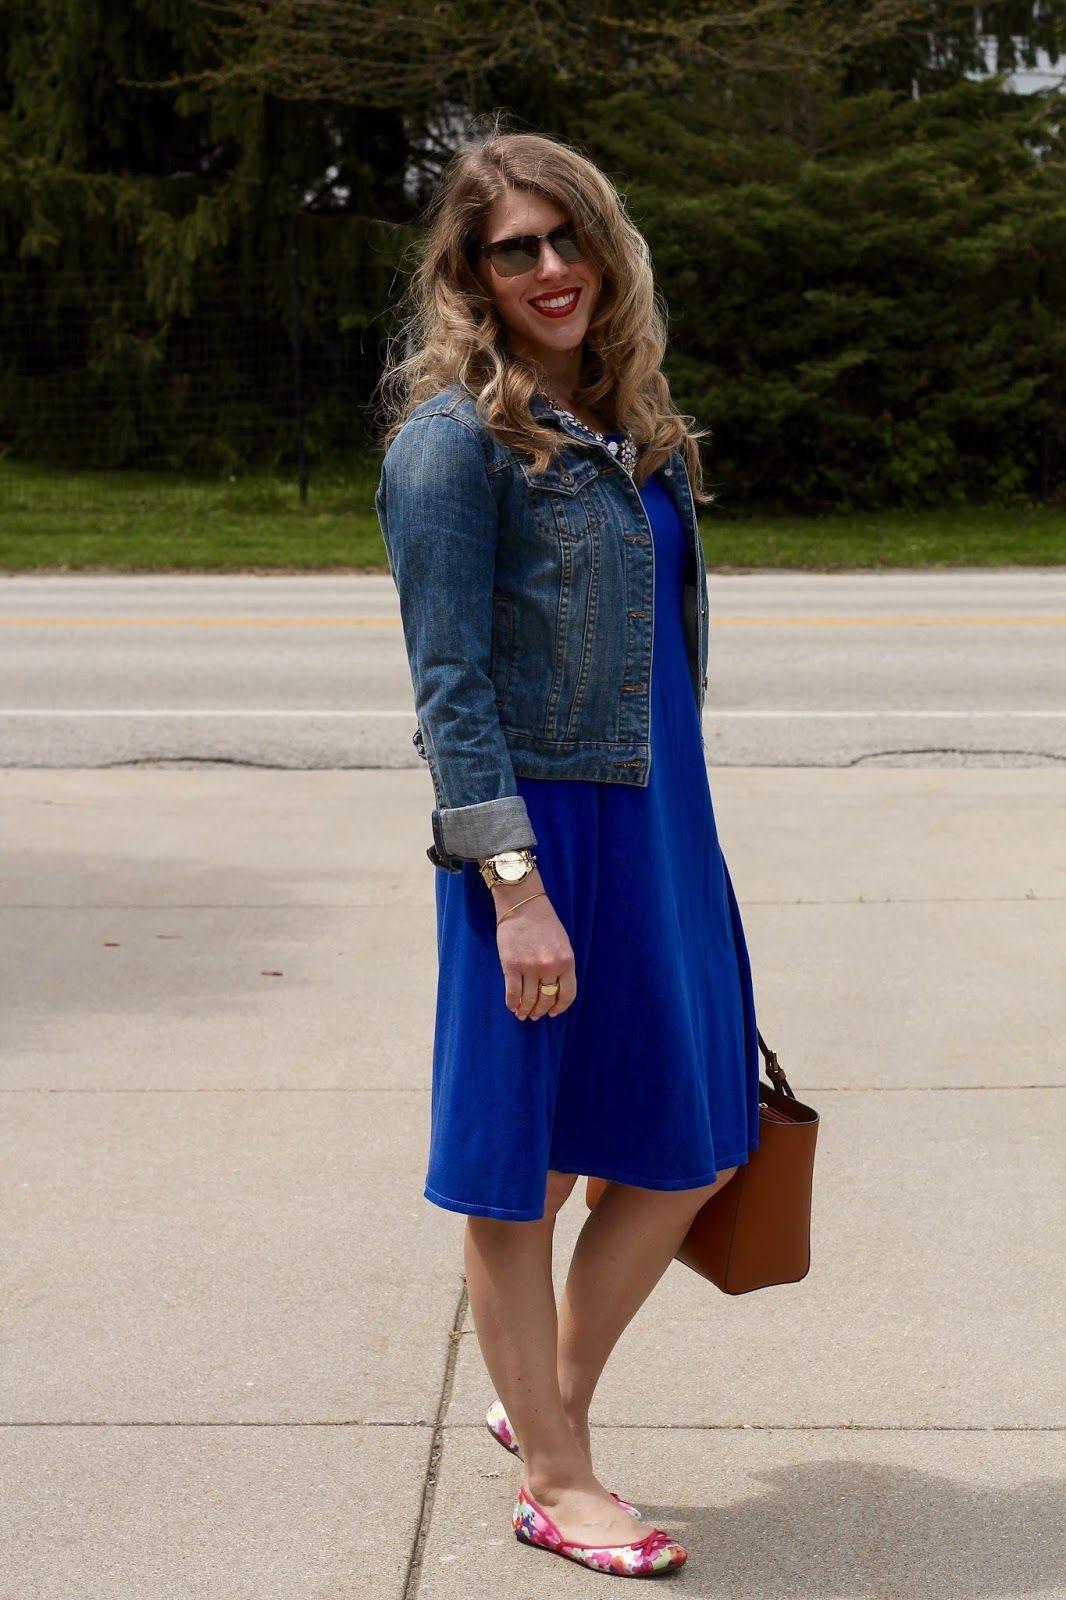 Cobalt Blue Dress Denim Jacket Floral Flats I Do Declaire